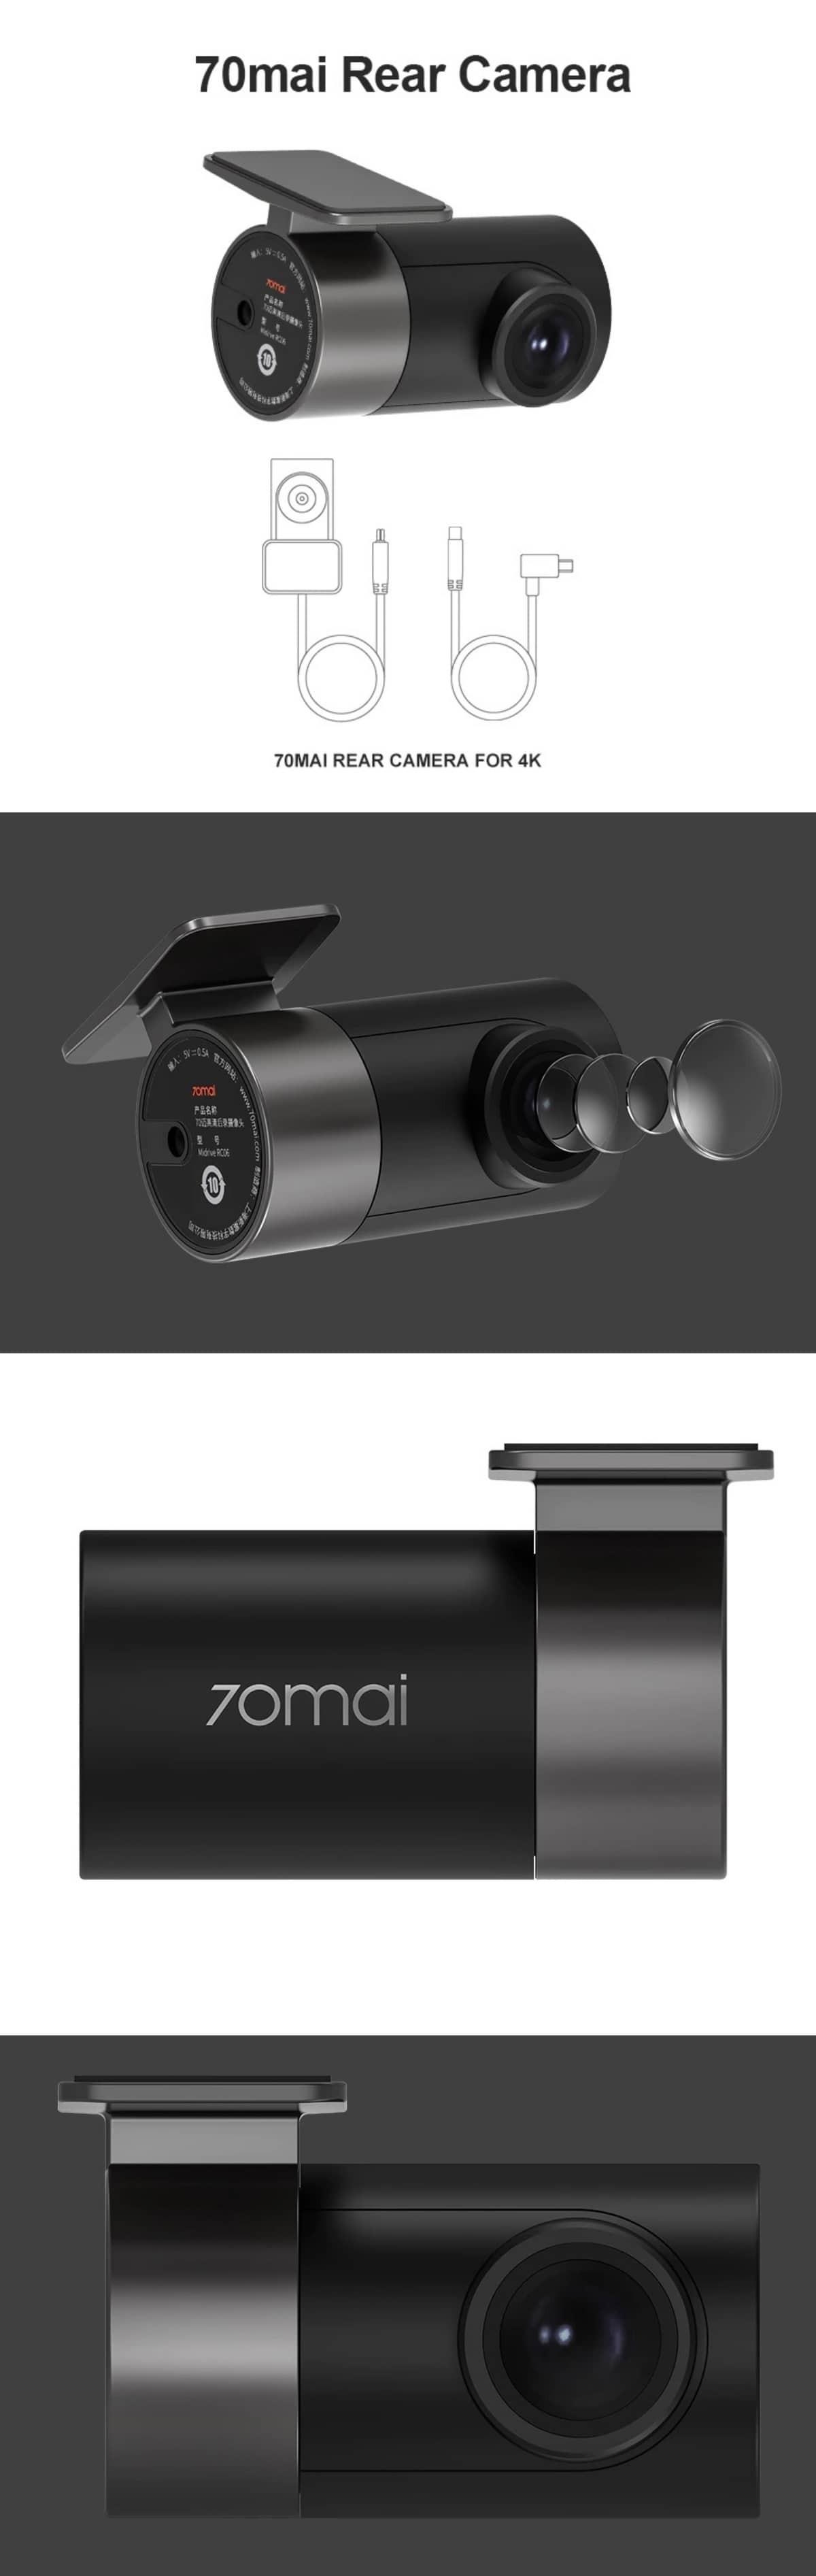 70MAI-MiDrive-RC06c24502664818d167.jpg